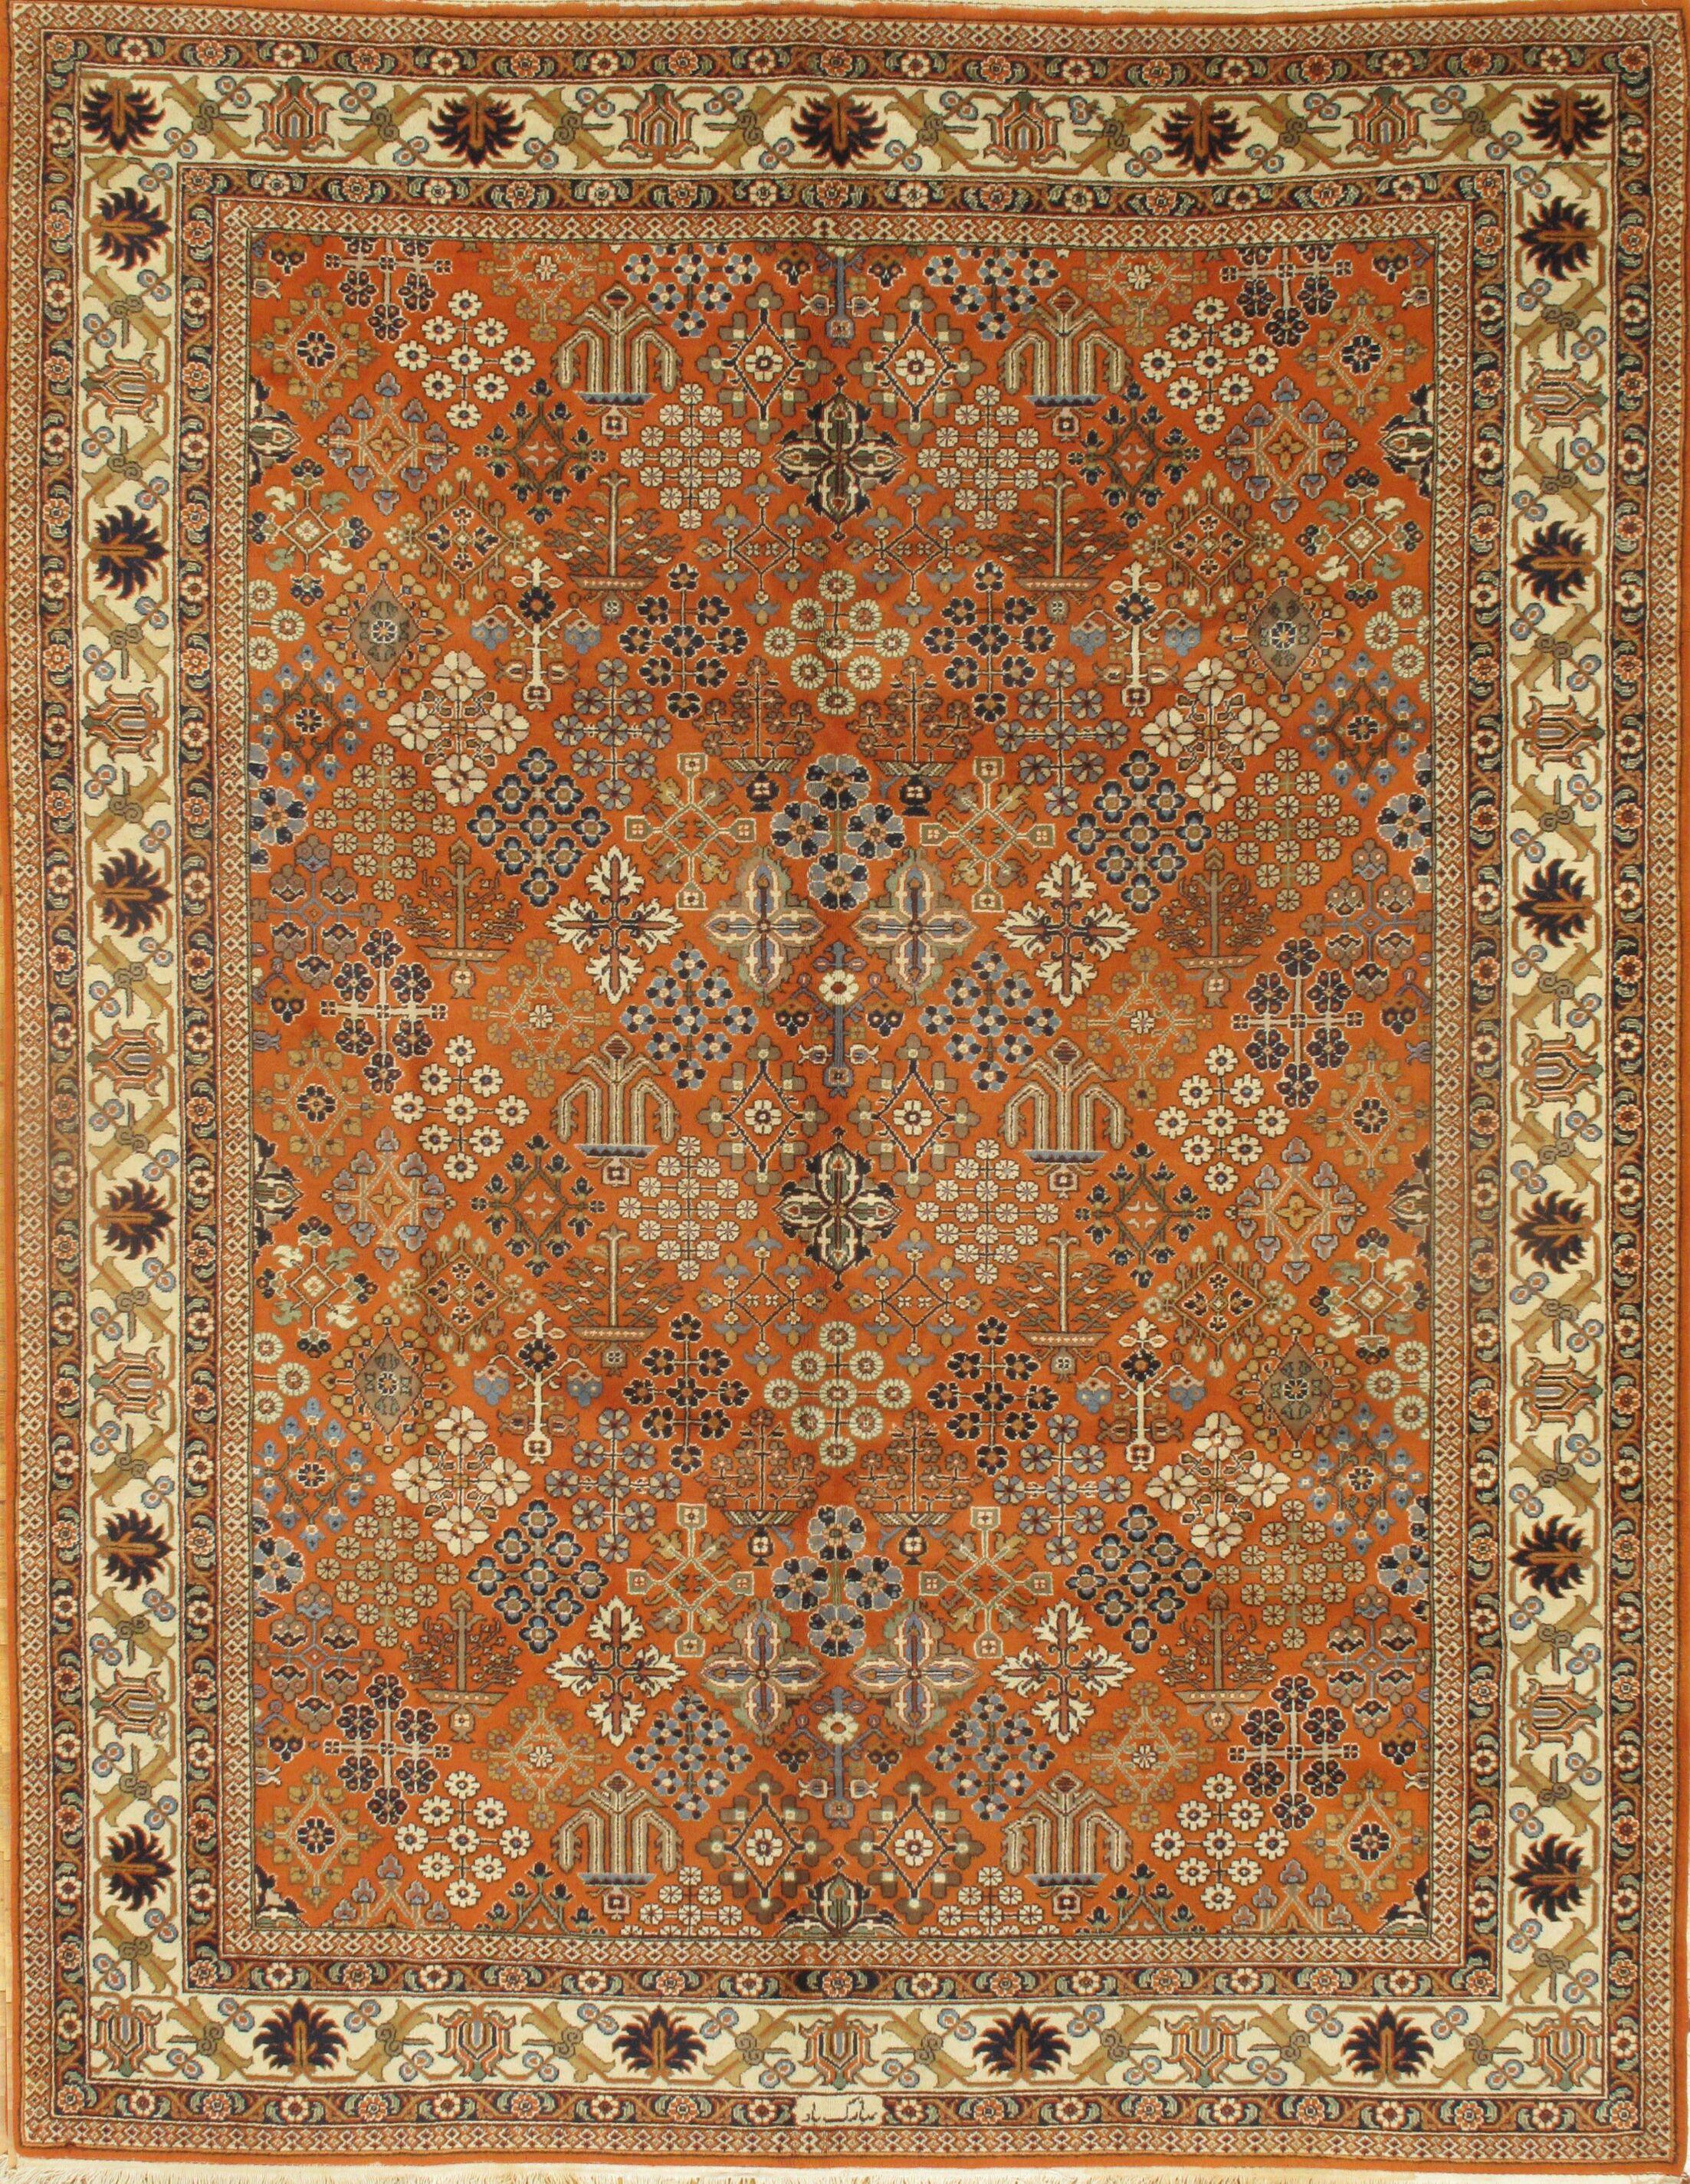 Original Romanian Josheghan Hand-Knotted Wool Orange/Beige Area Rug